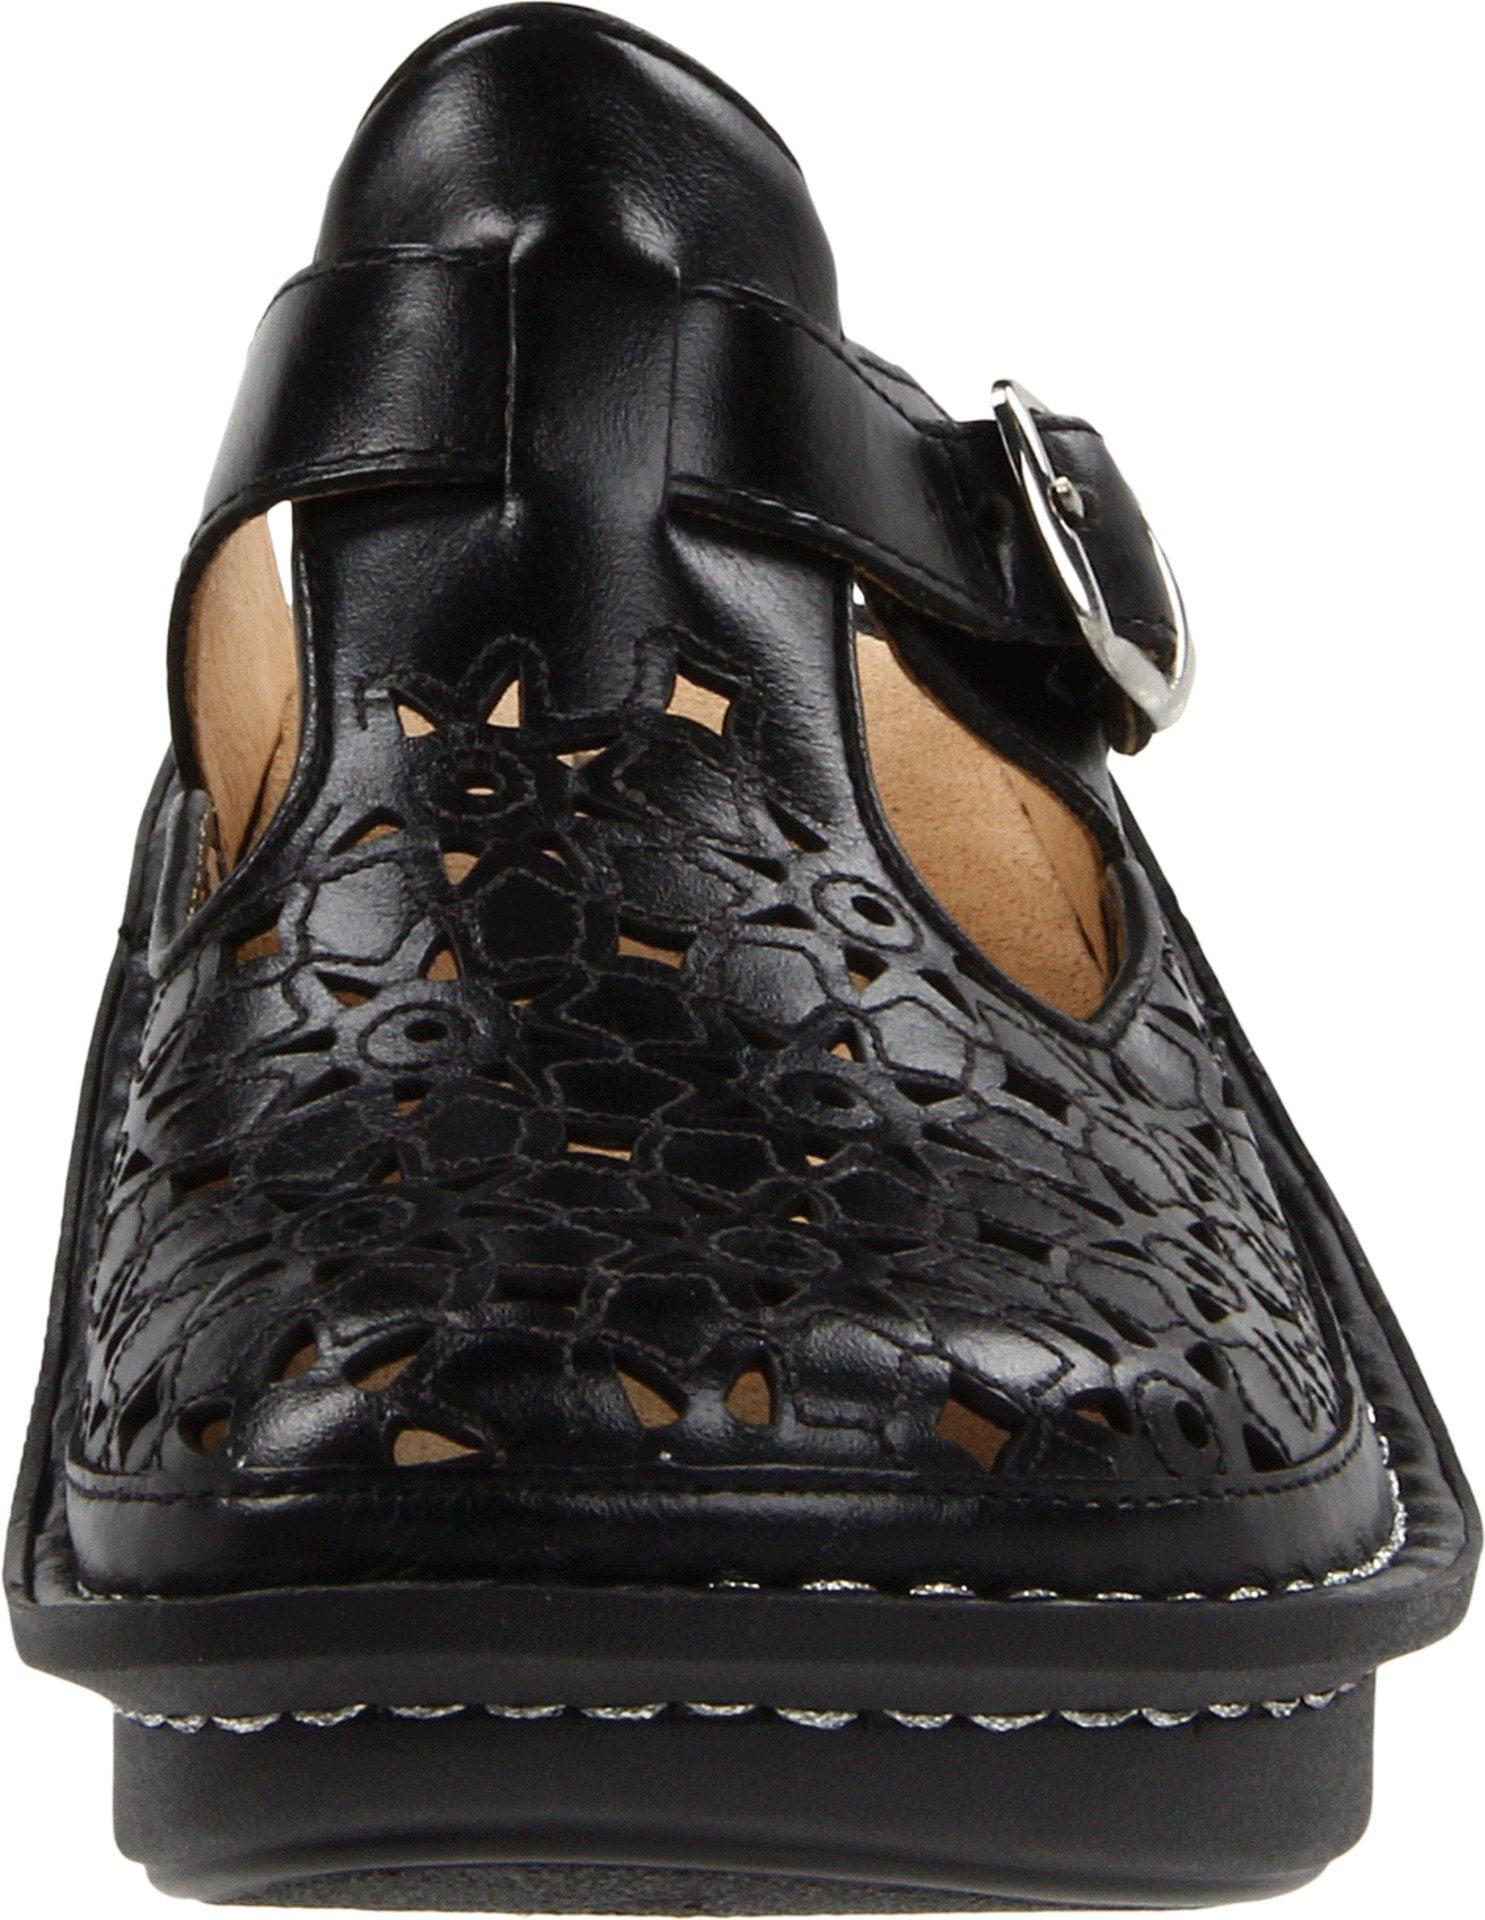 Alegria ALG-631 : Women's Classic Clog Dusty Black (39 M EU / 9-9.5 B(M)  US) - Walmart.com